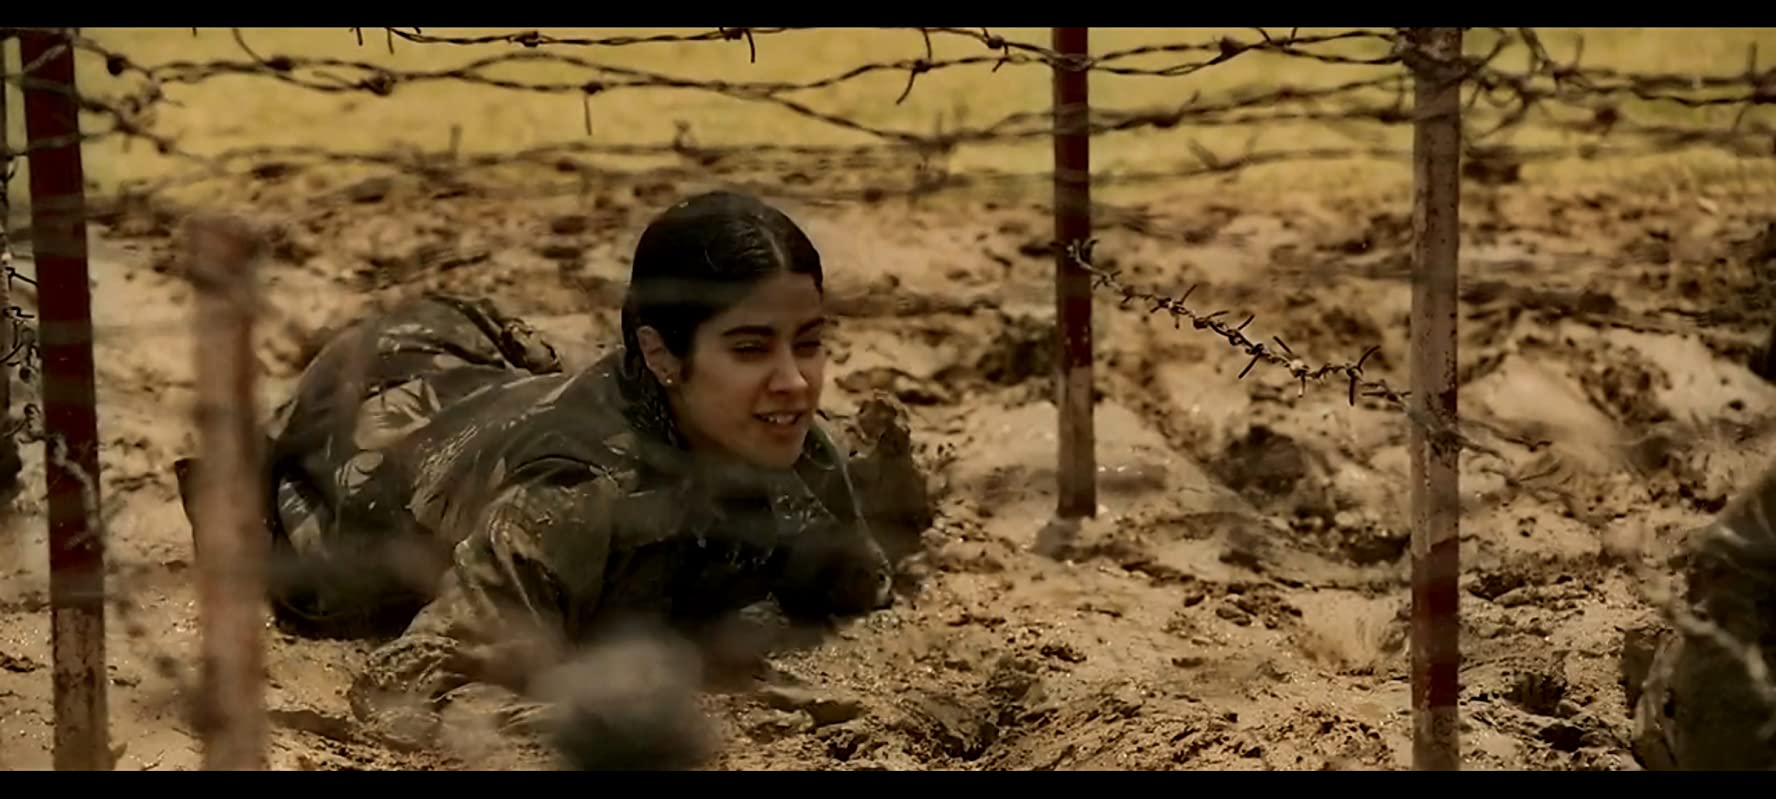 Janhvi Kapoor in Gunjan Saxena: The Kargil Girl (2020)